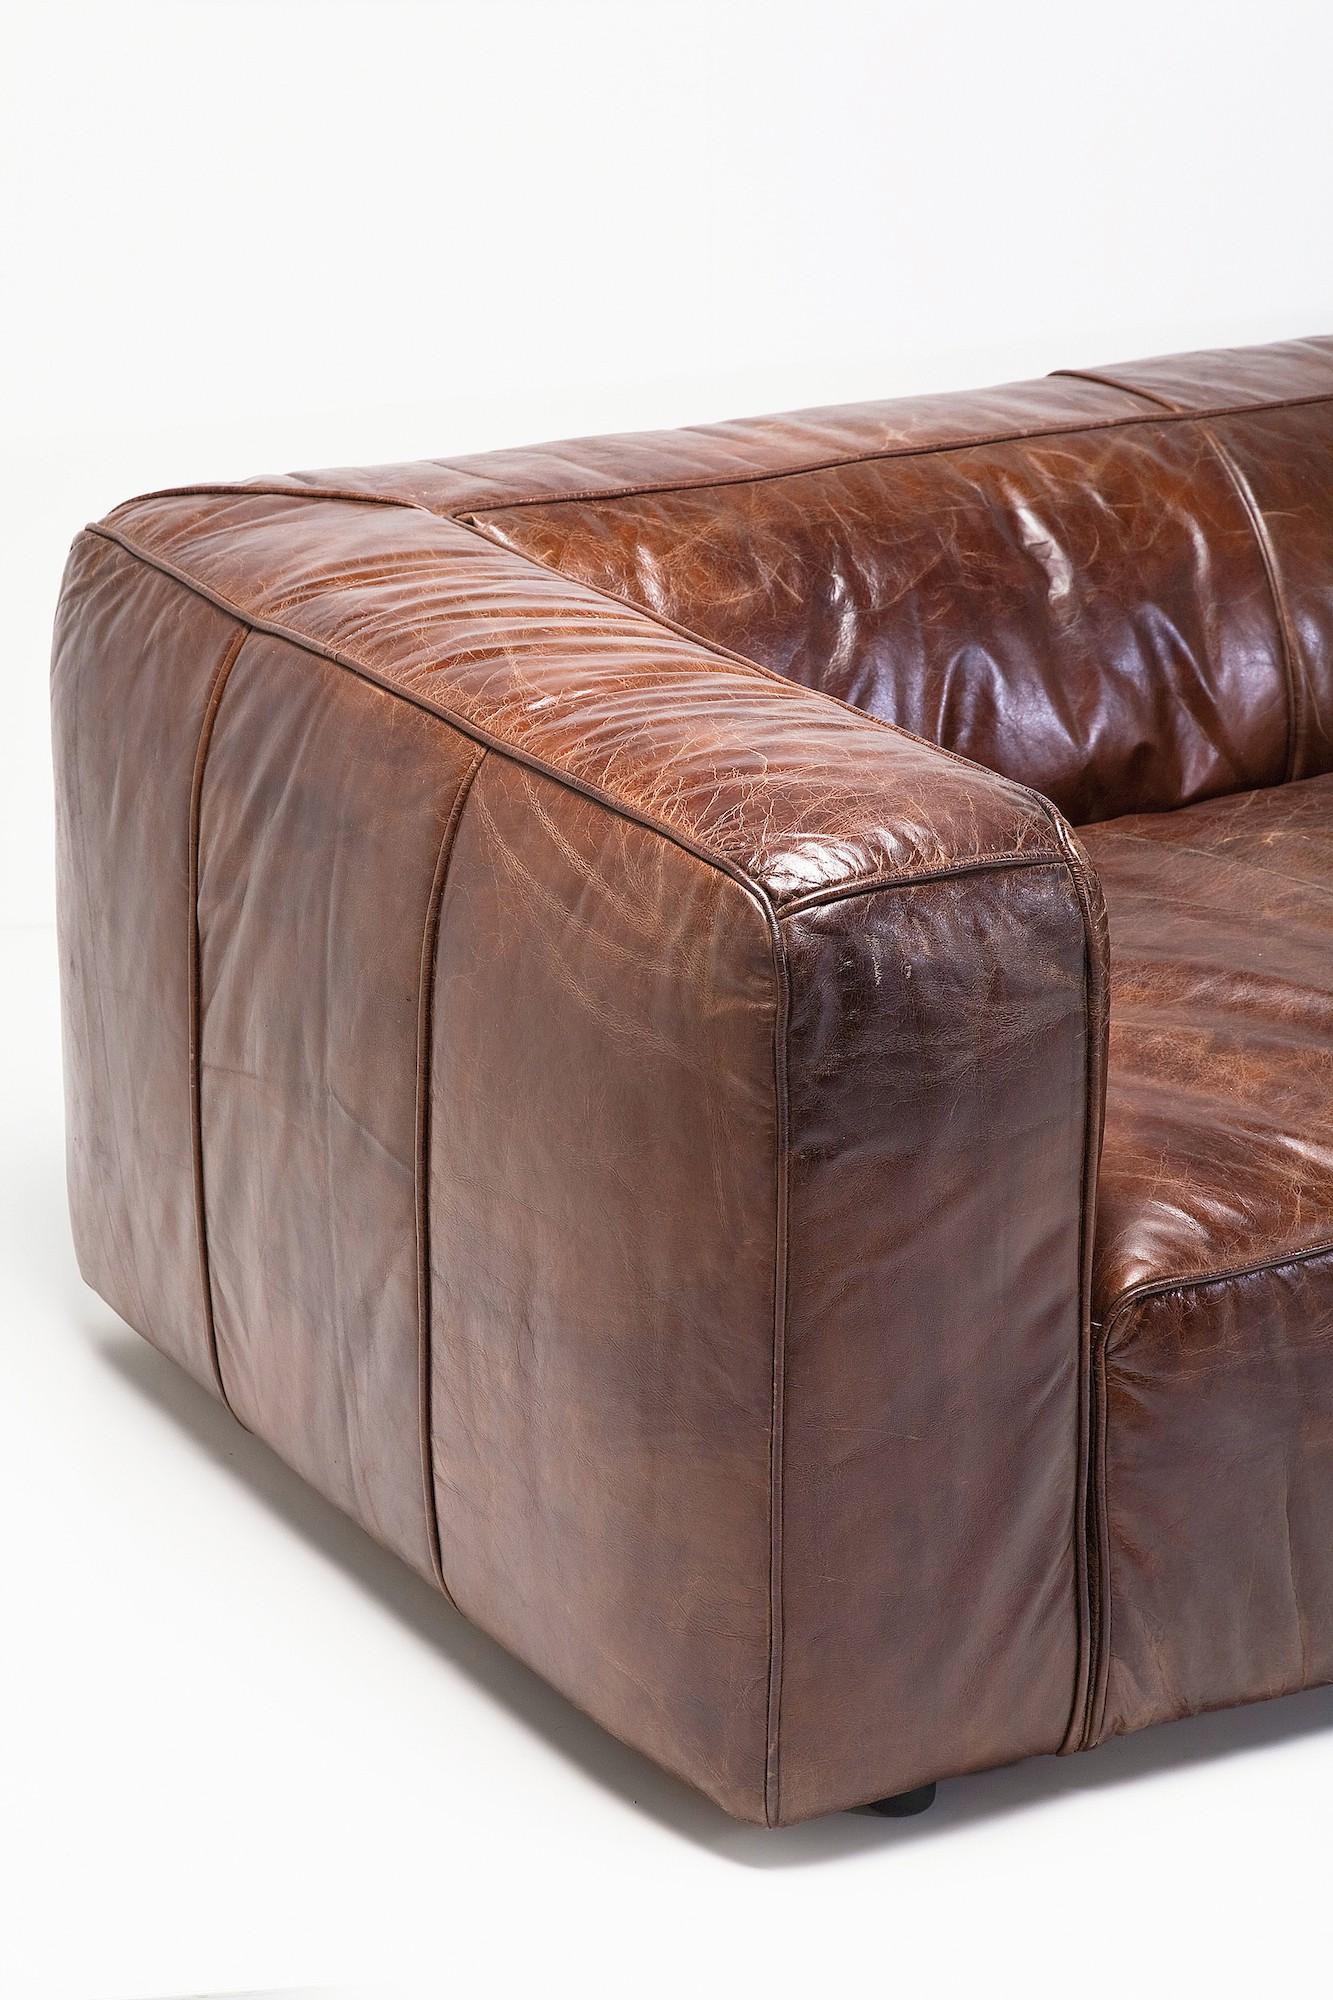 sofa cubetto leder braun. Black Bedroom Furniture Sets. Home Design Ideas